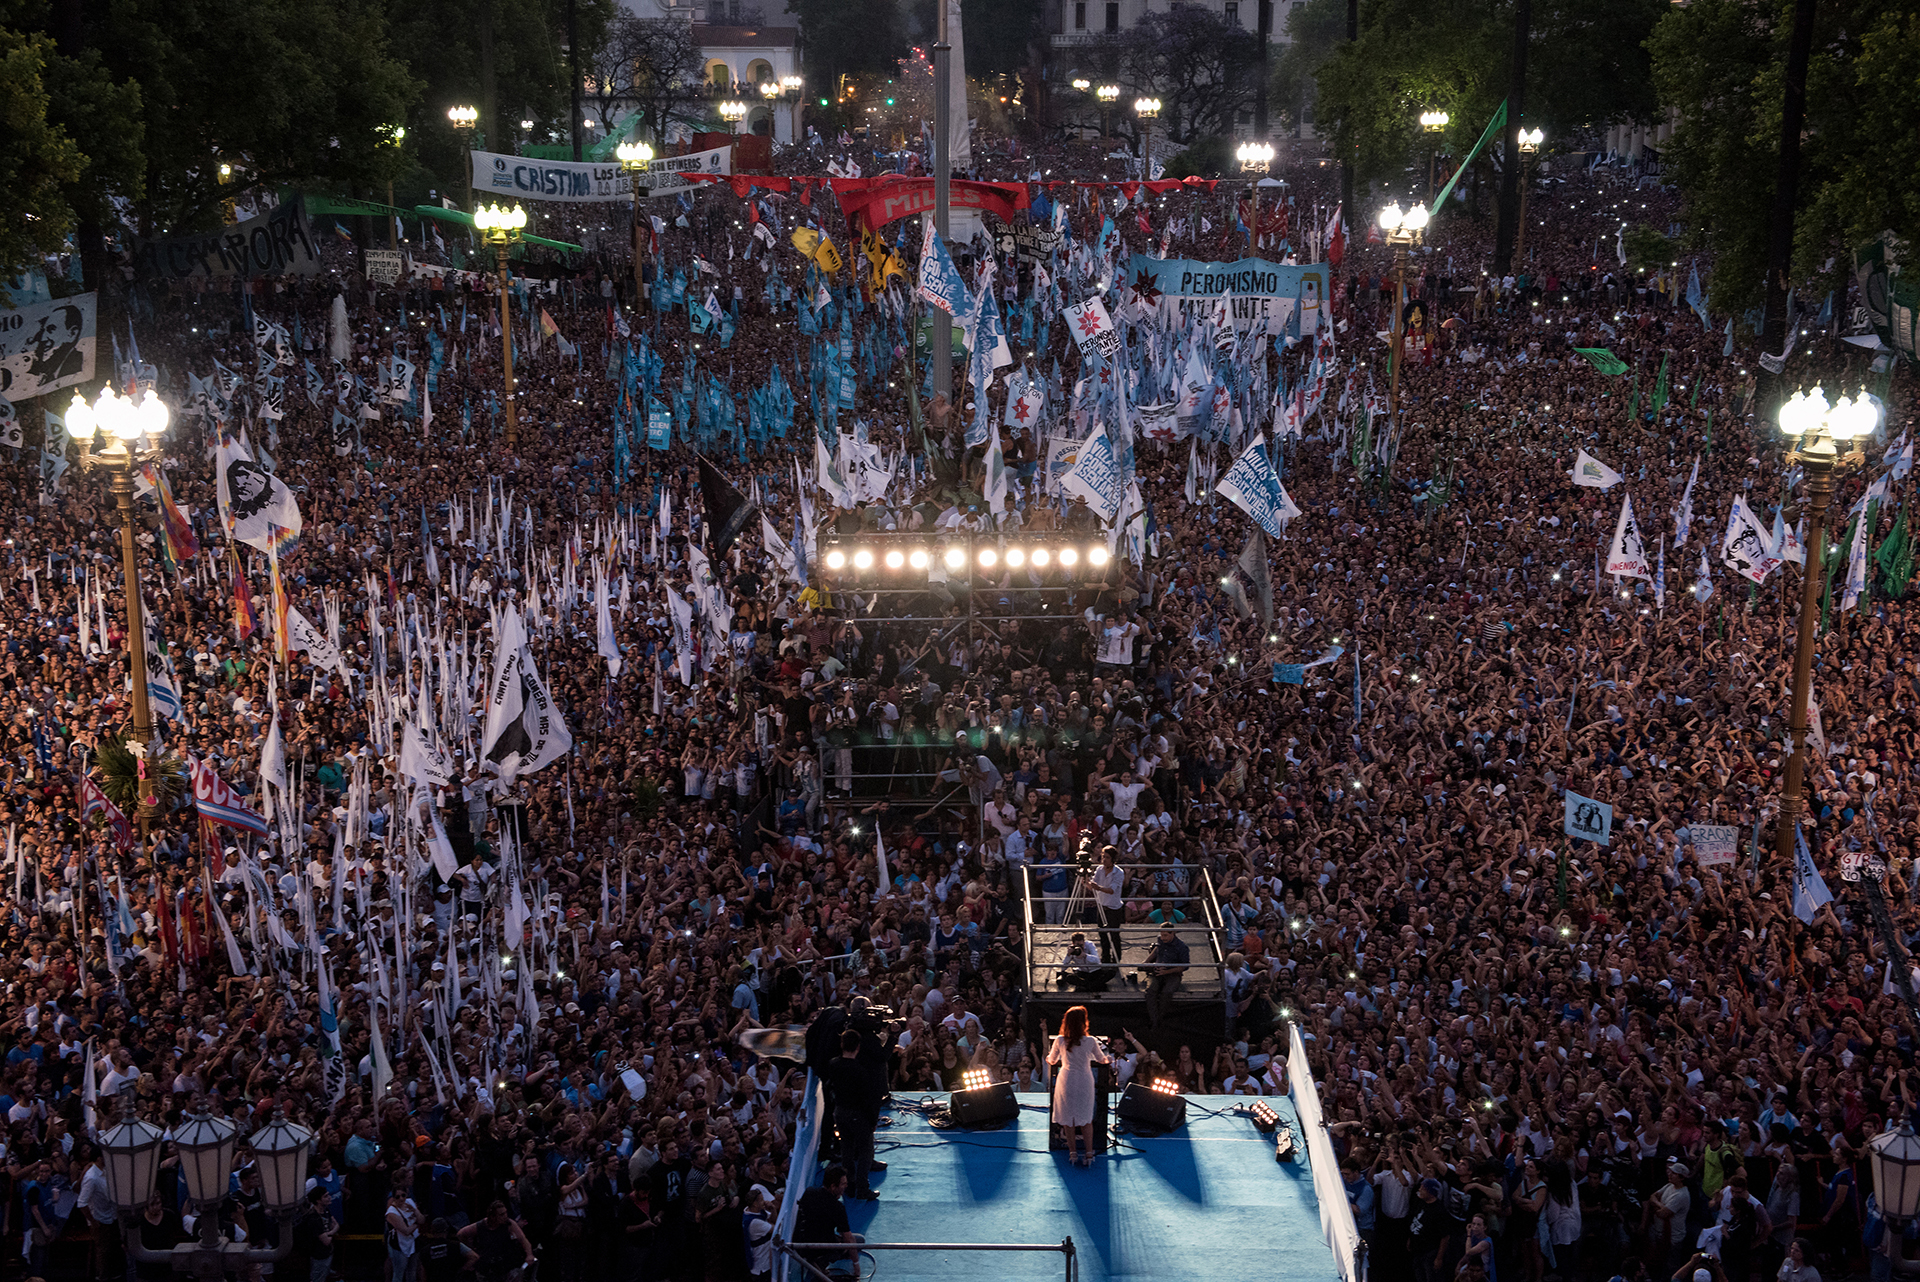 La presidenta Cristina Fernandez de Kirchner da su ultimo discurso en la Plaza de Mayo (Maria Eugenia Cerruti)